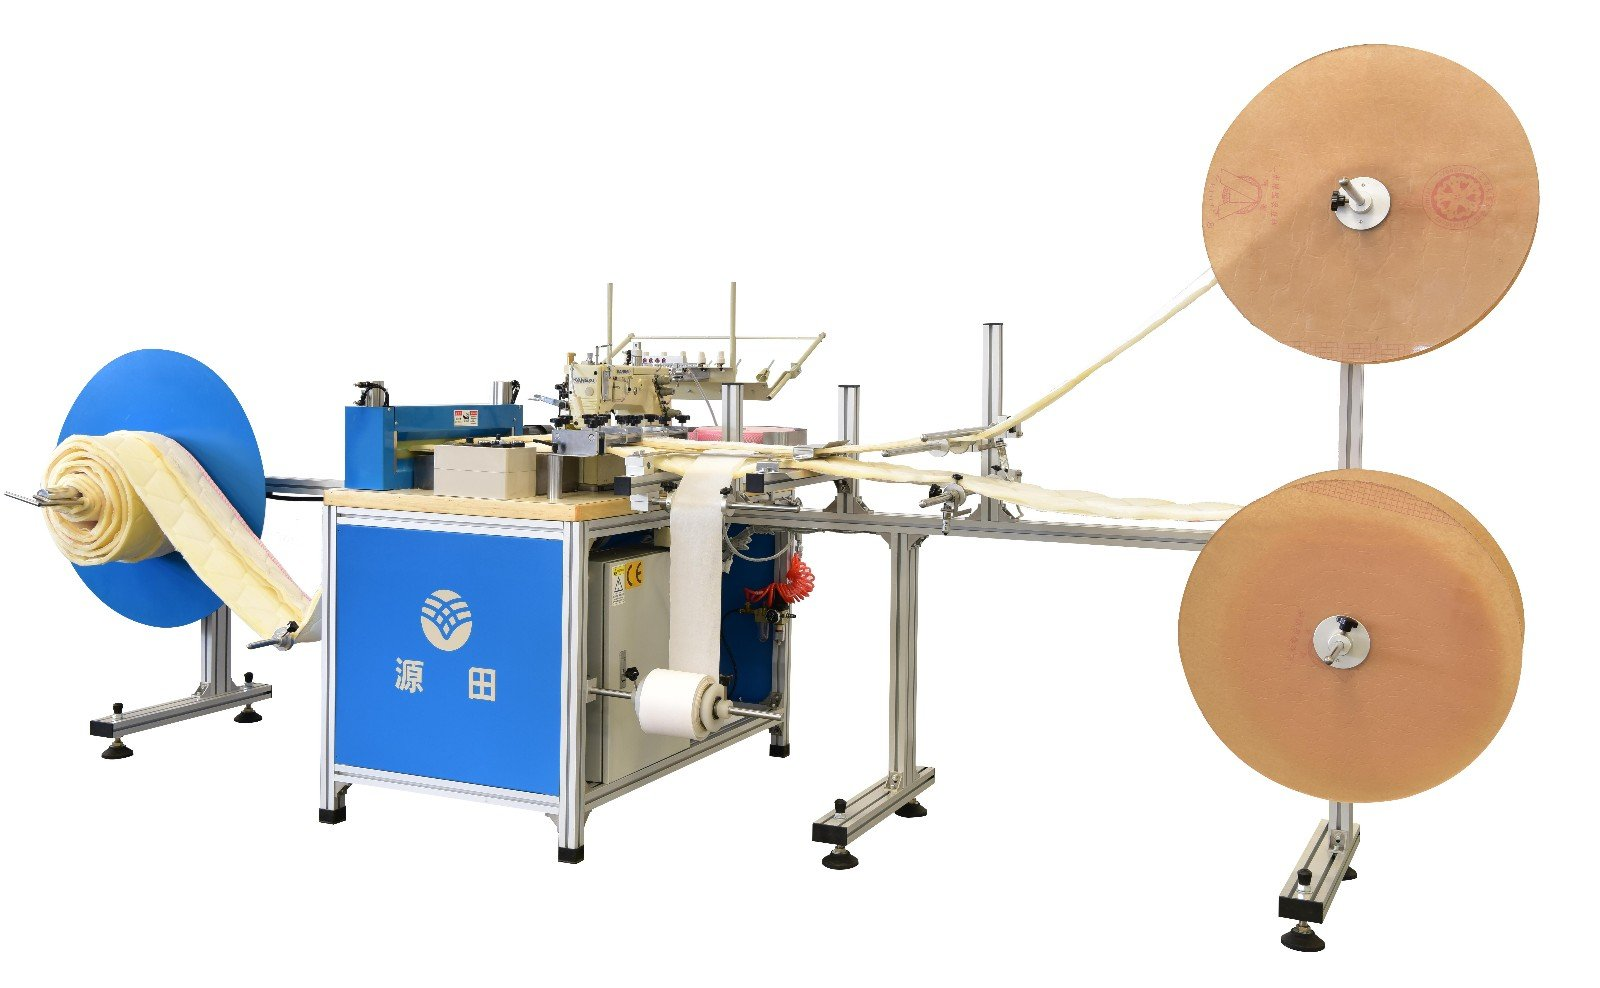 singer  mattress  sewing machine price autimatic decorative border long YUANTIAN Mattress Machines